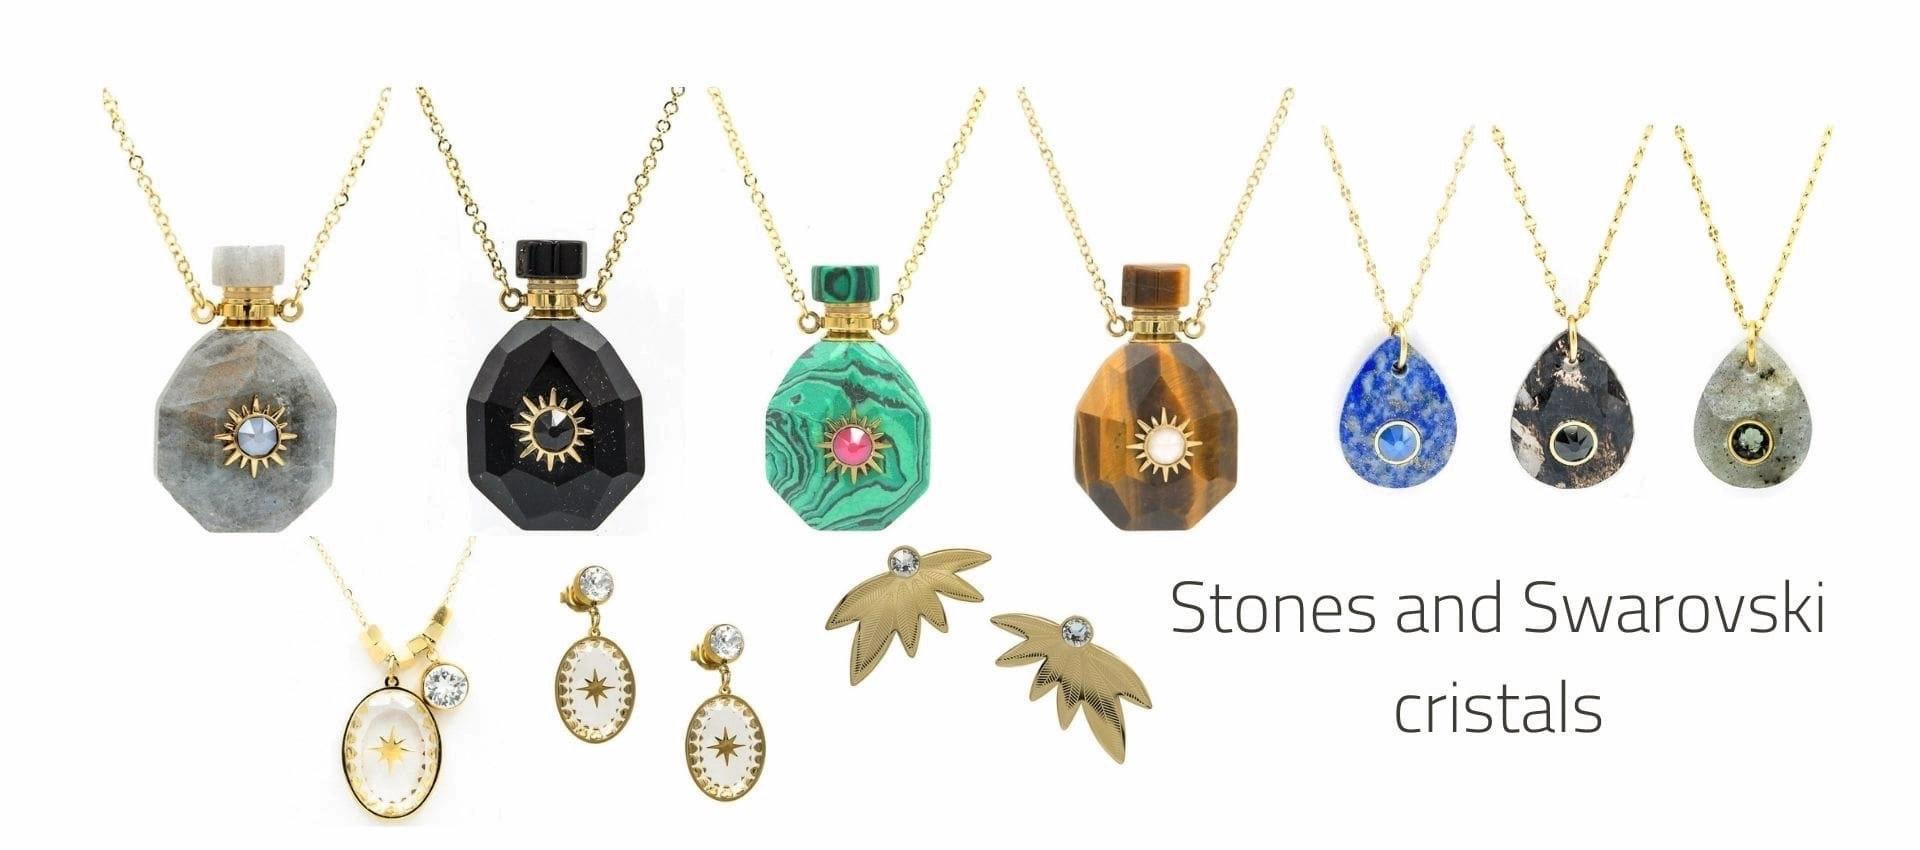 Jewellery adorned with Swarovski crystals